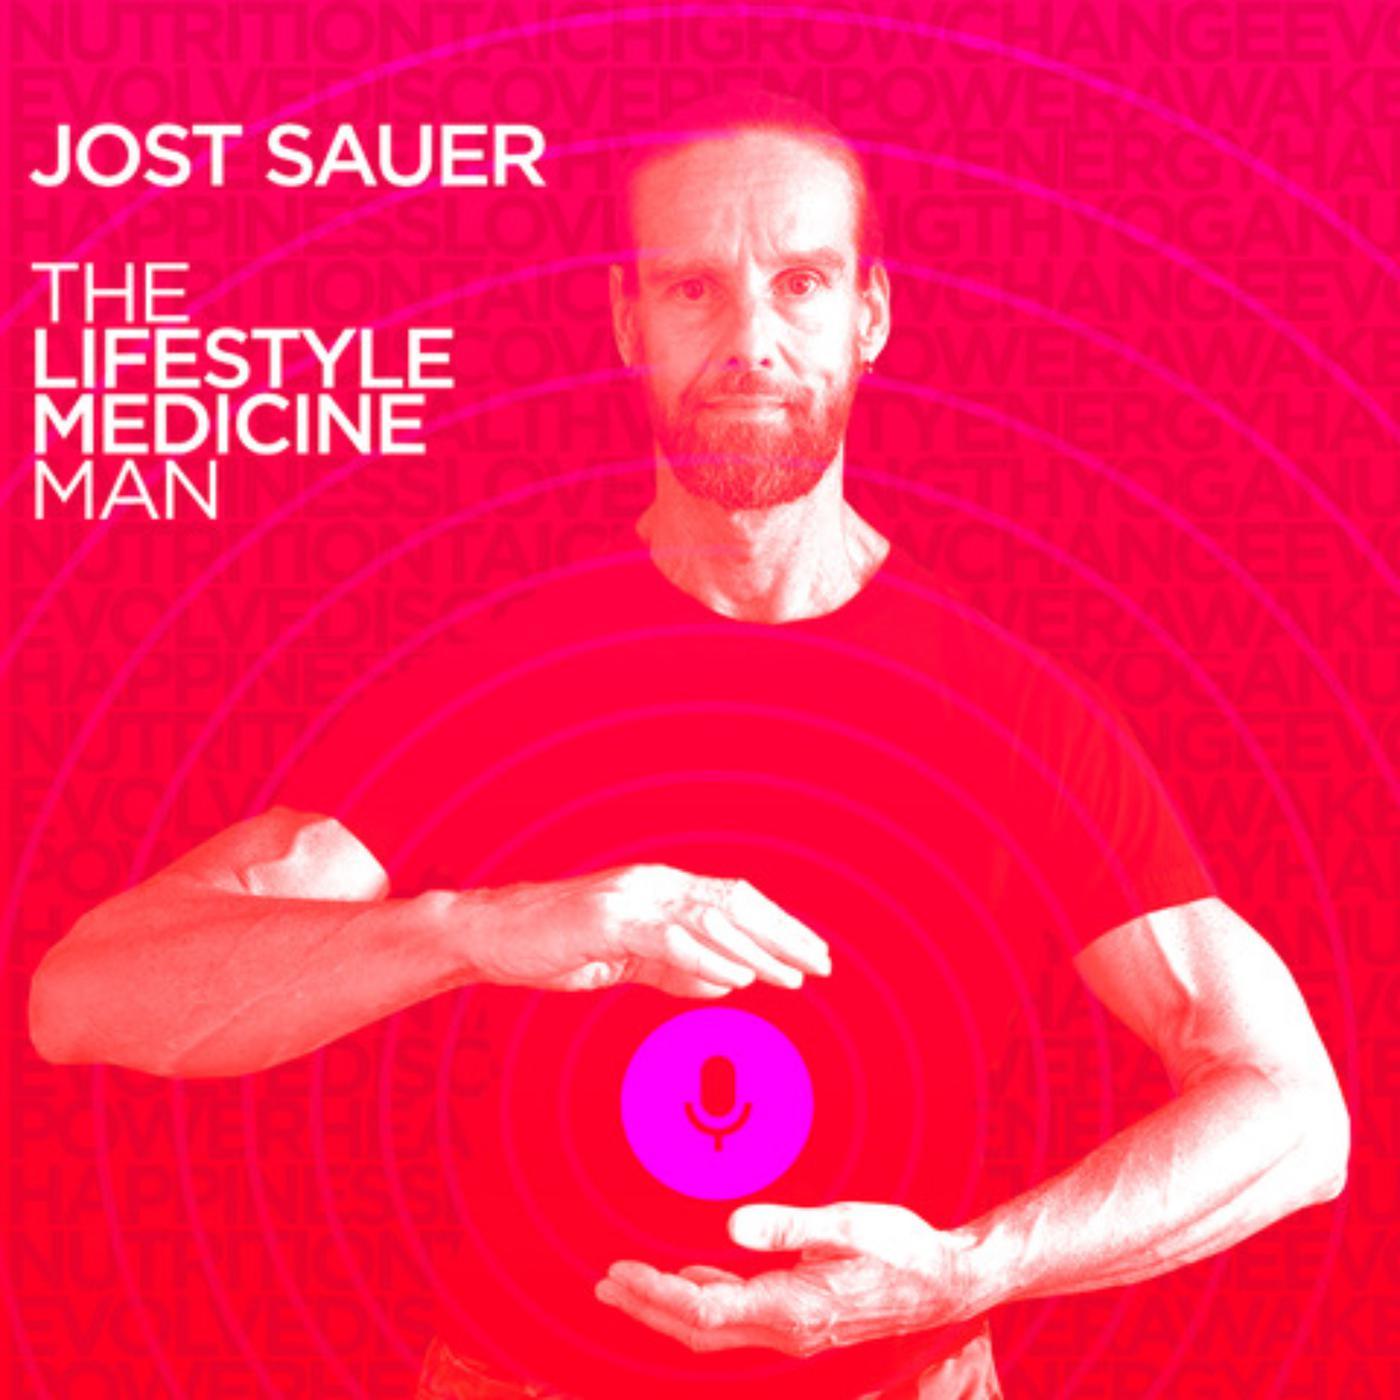 JOST SAUER: The Lifestyle Medicine Man (podcast) - RYSK